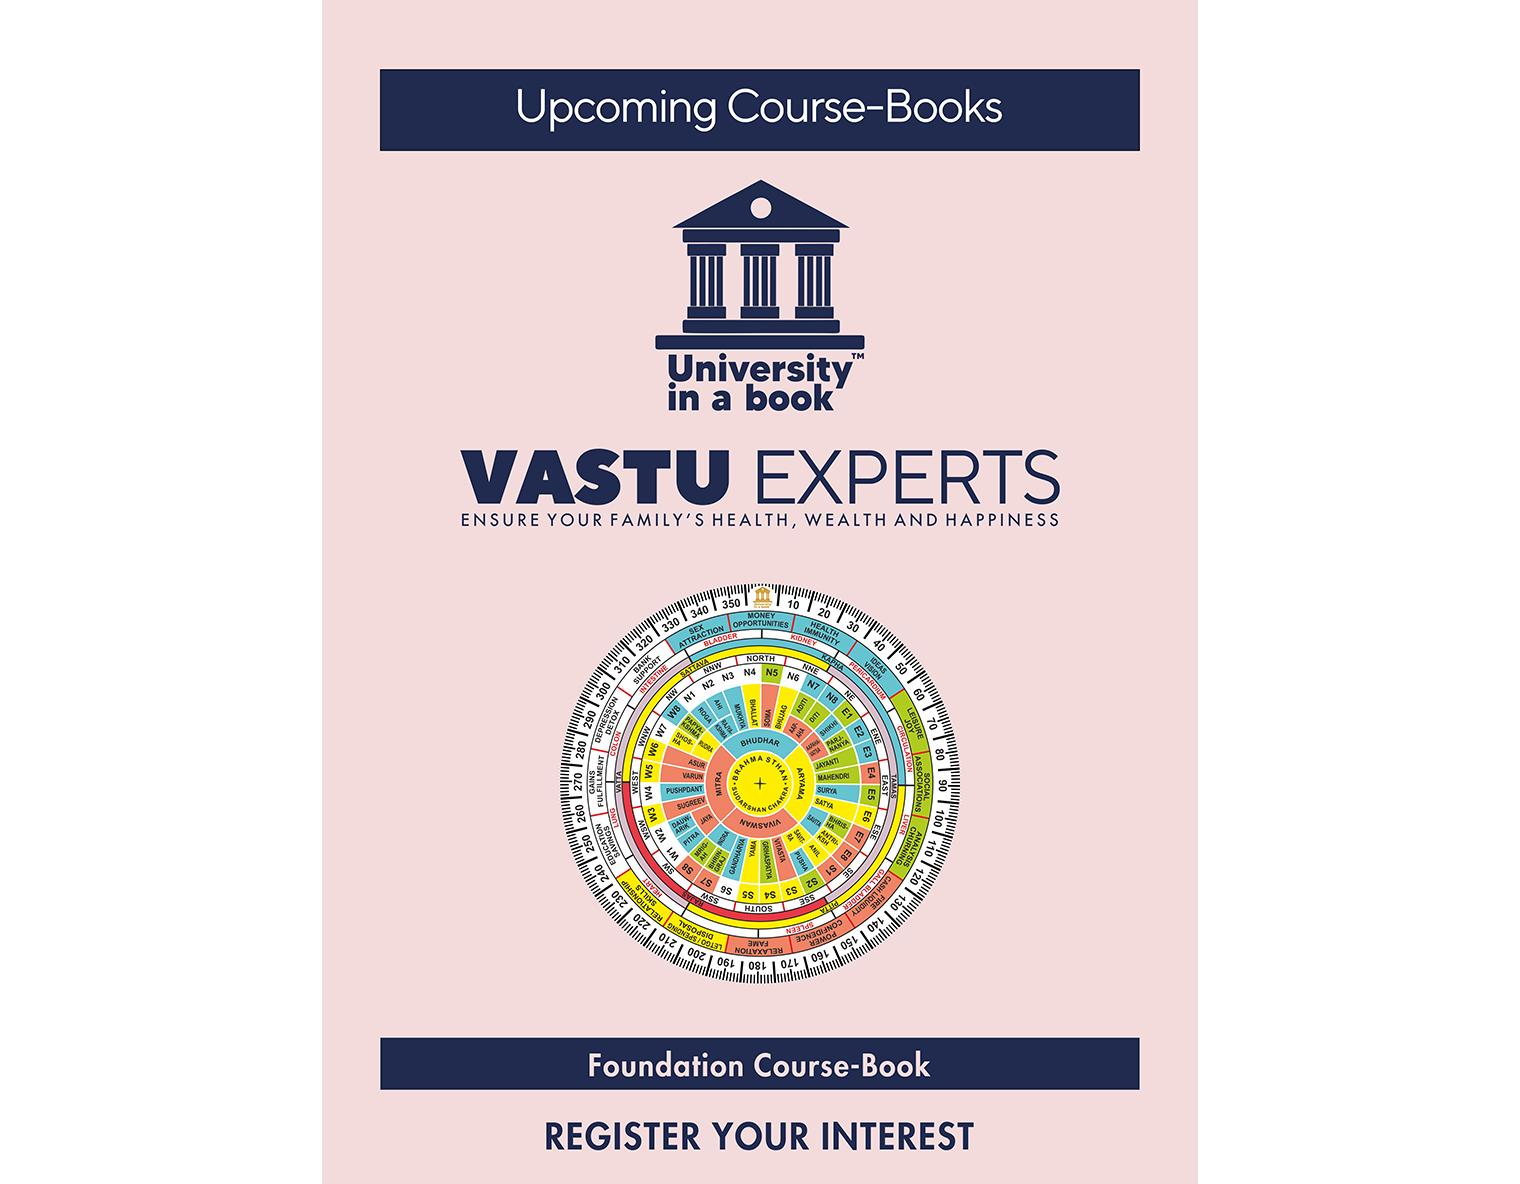 VastuExperts Foundation Course-Book